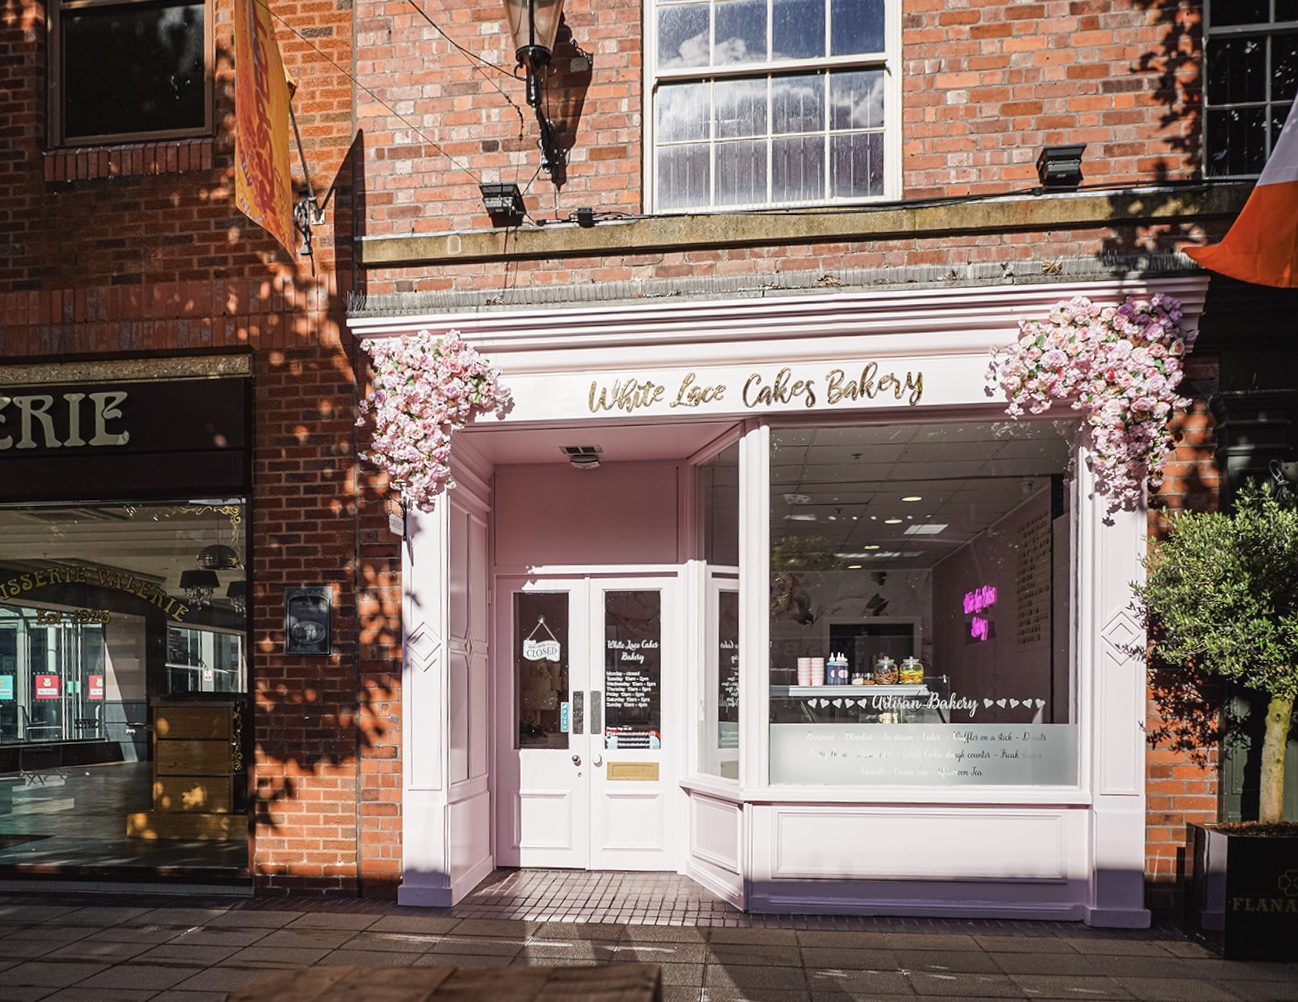 White Lace Cakes Bakery